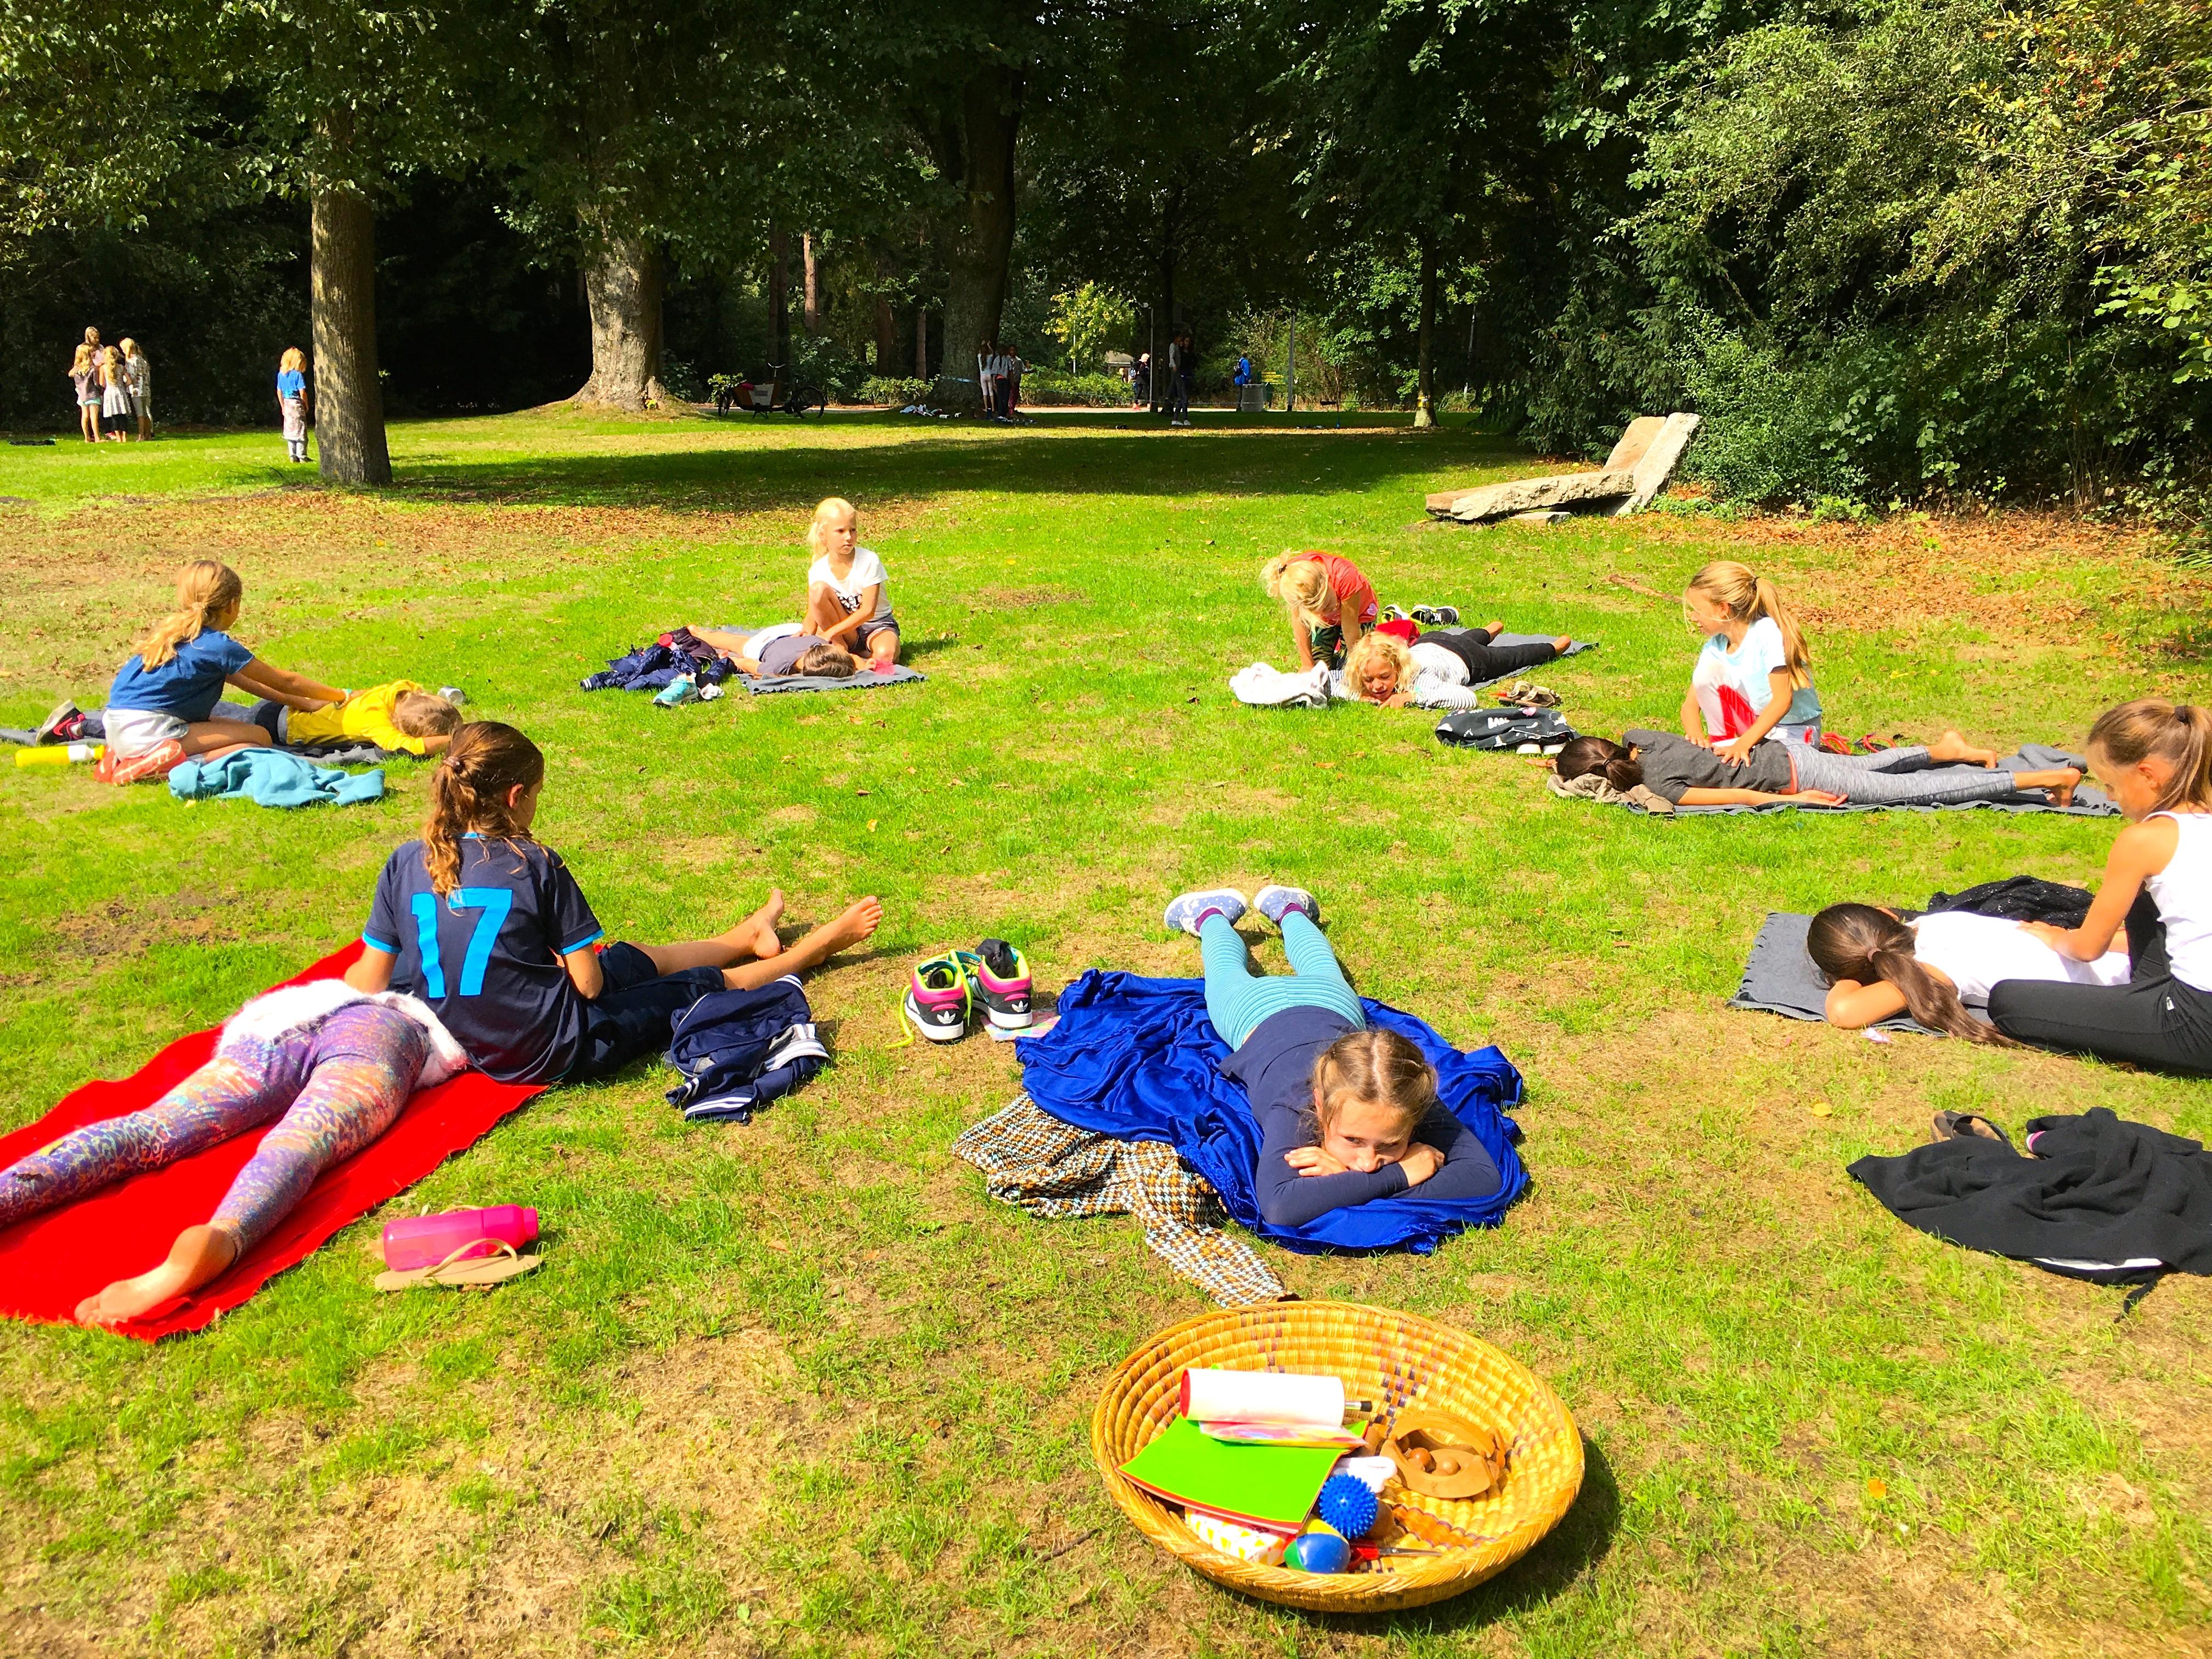 de Kinderyogatuin yogakamp zomerkamp - massage parcours - kinderyoga mindfulness meditatie massage buitenyoga Aemstel schooltuin Amsterdam Amstelveen